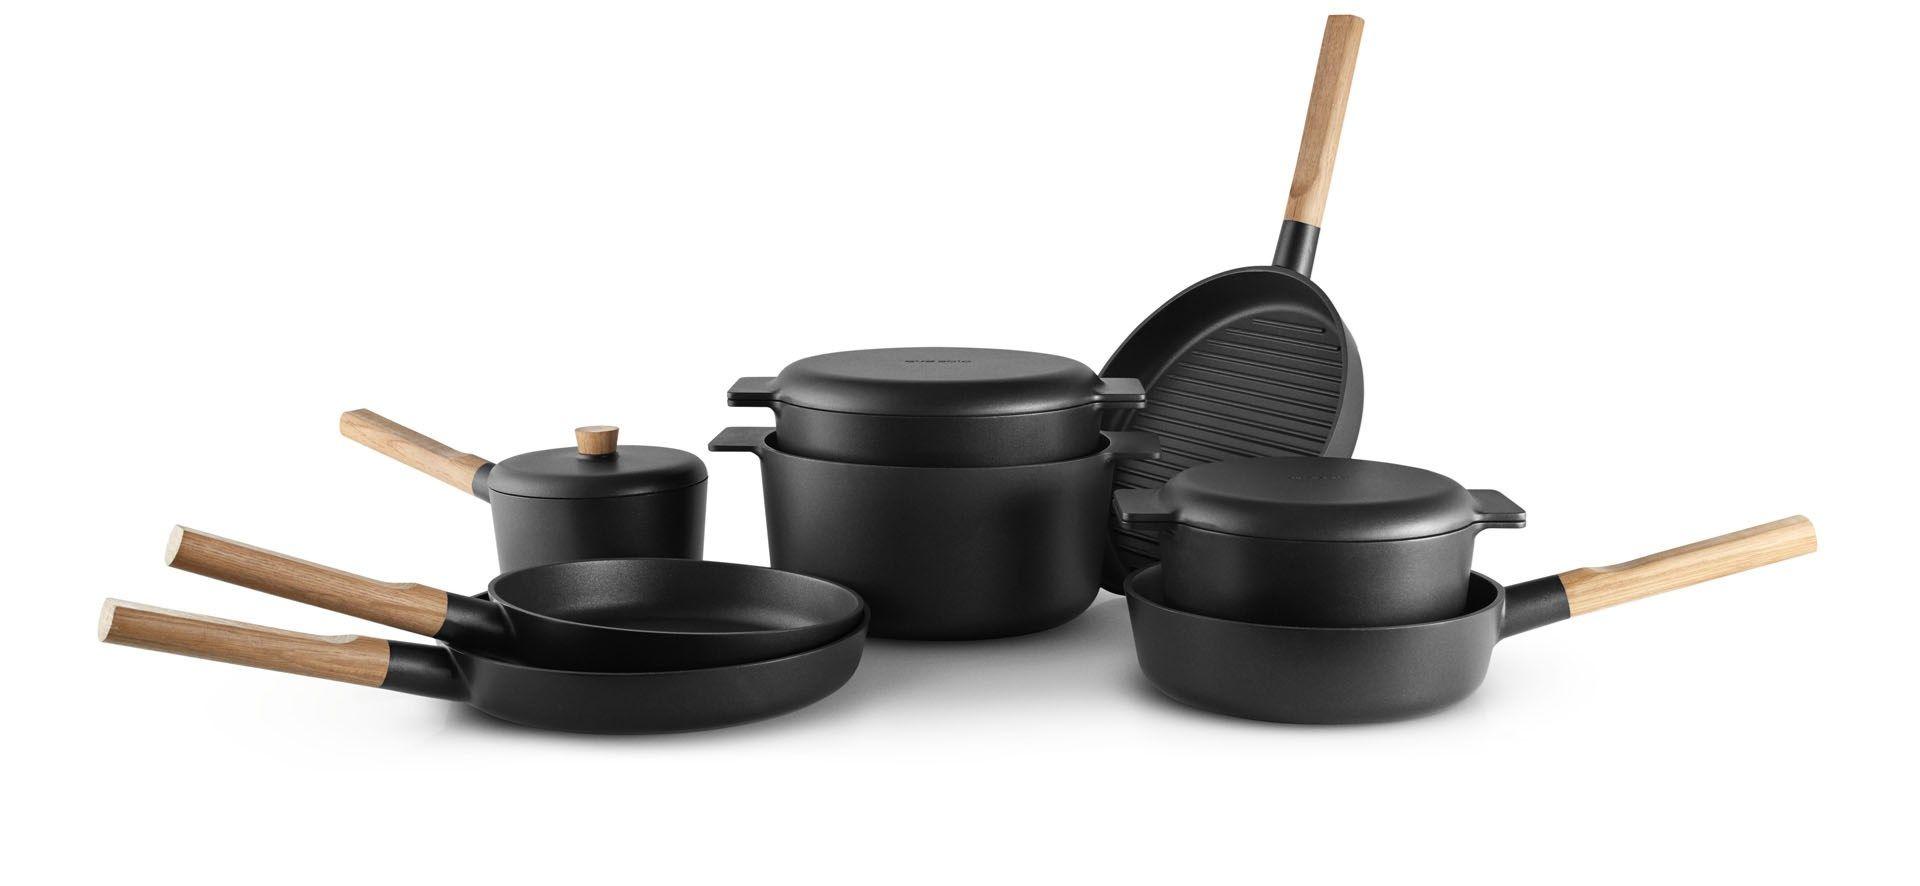 saucepan | Stuff for the House | Pinterest | Nordic kitchen ...